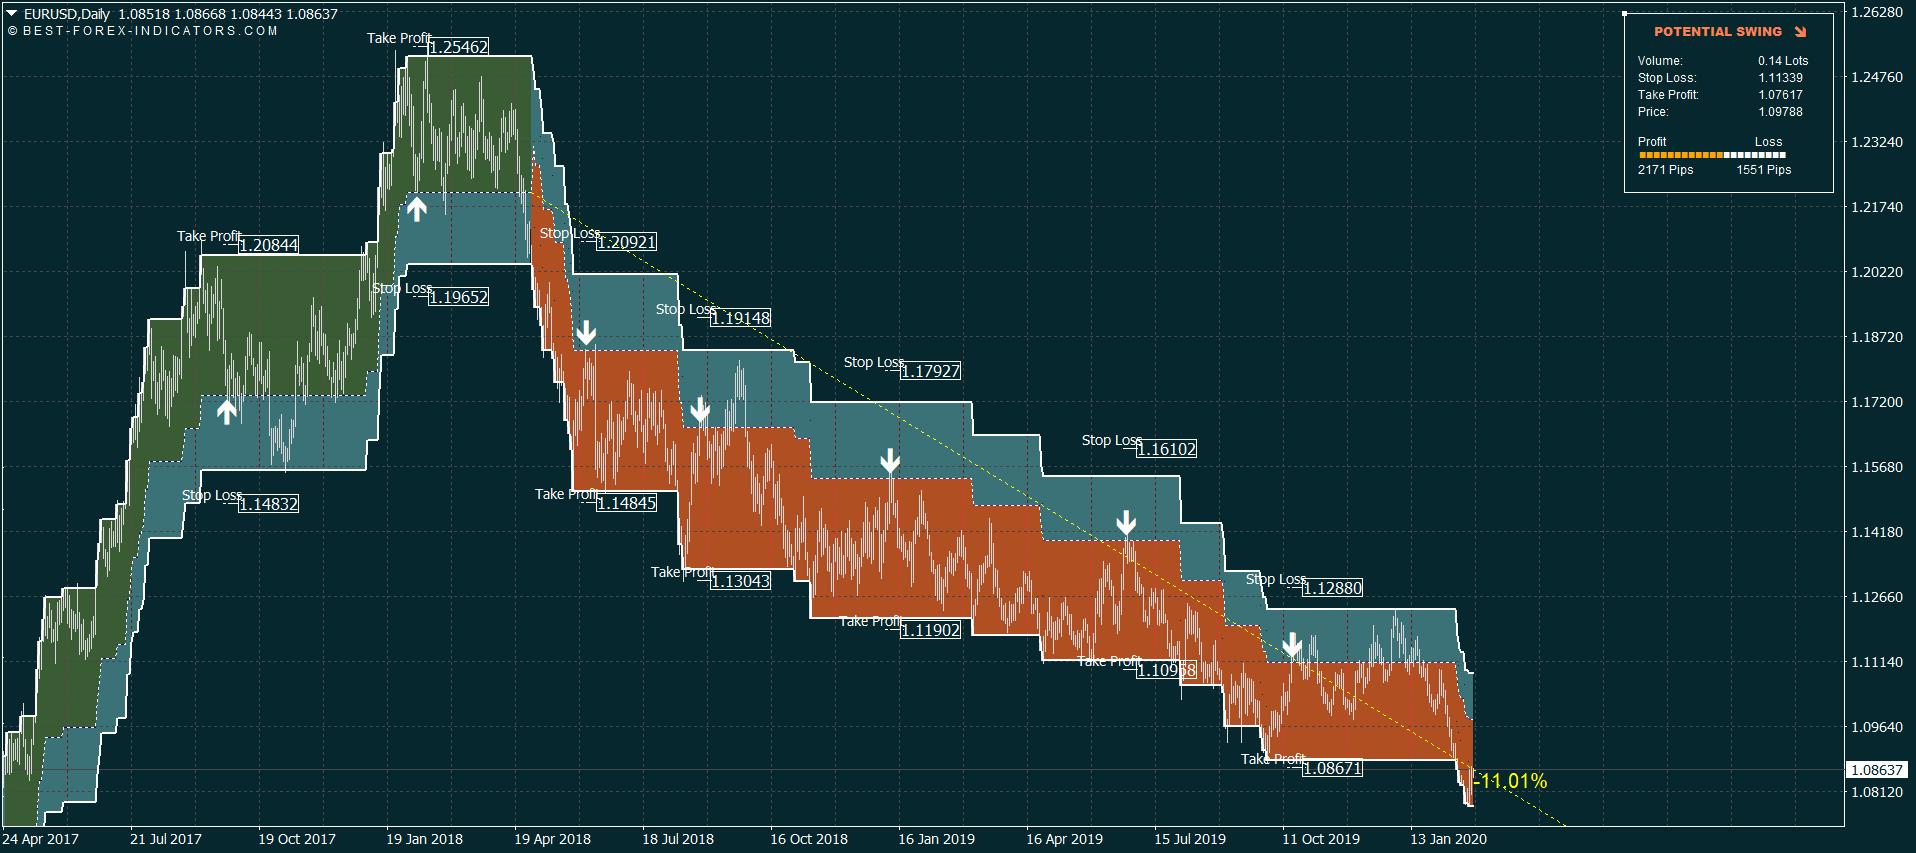 Swing Trading System EURUSD D1